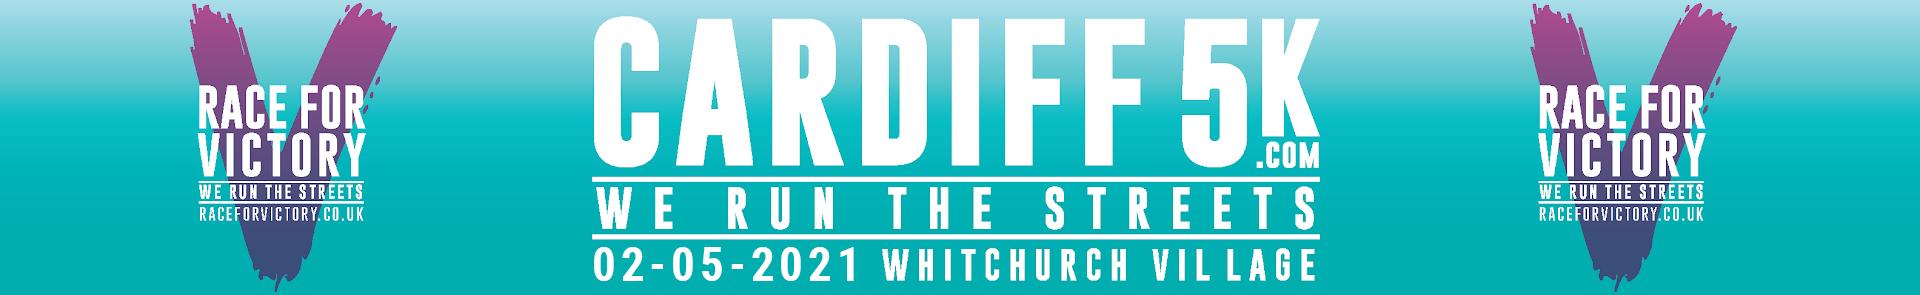 Cardiff5K RaceForVictory